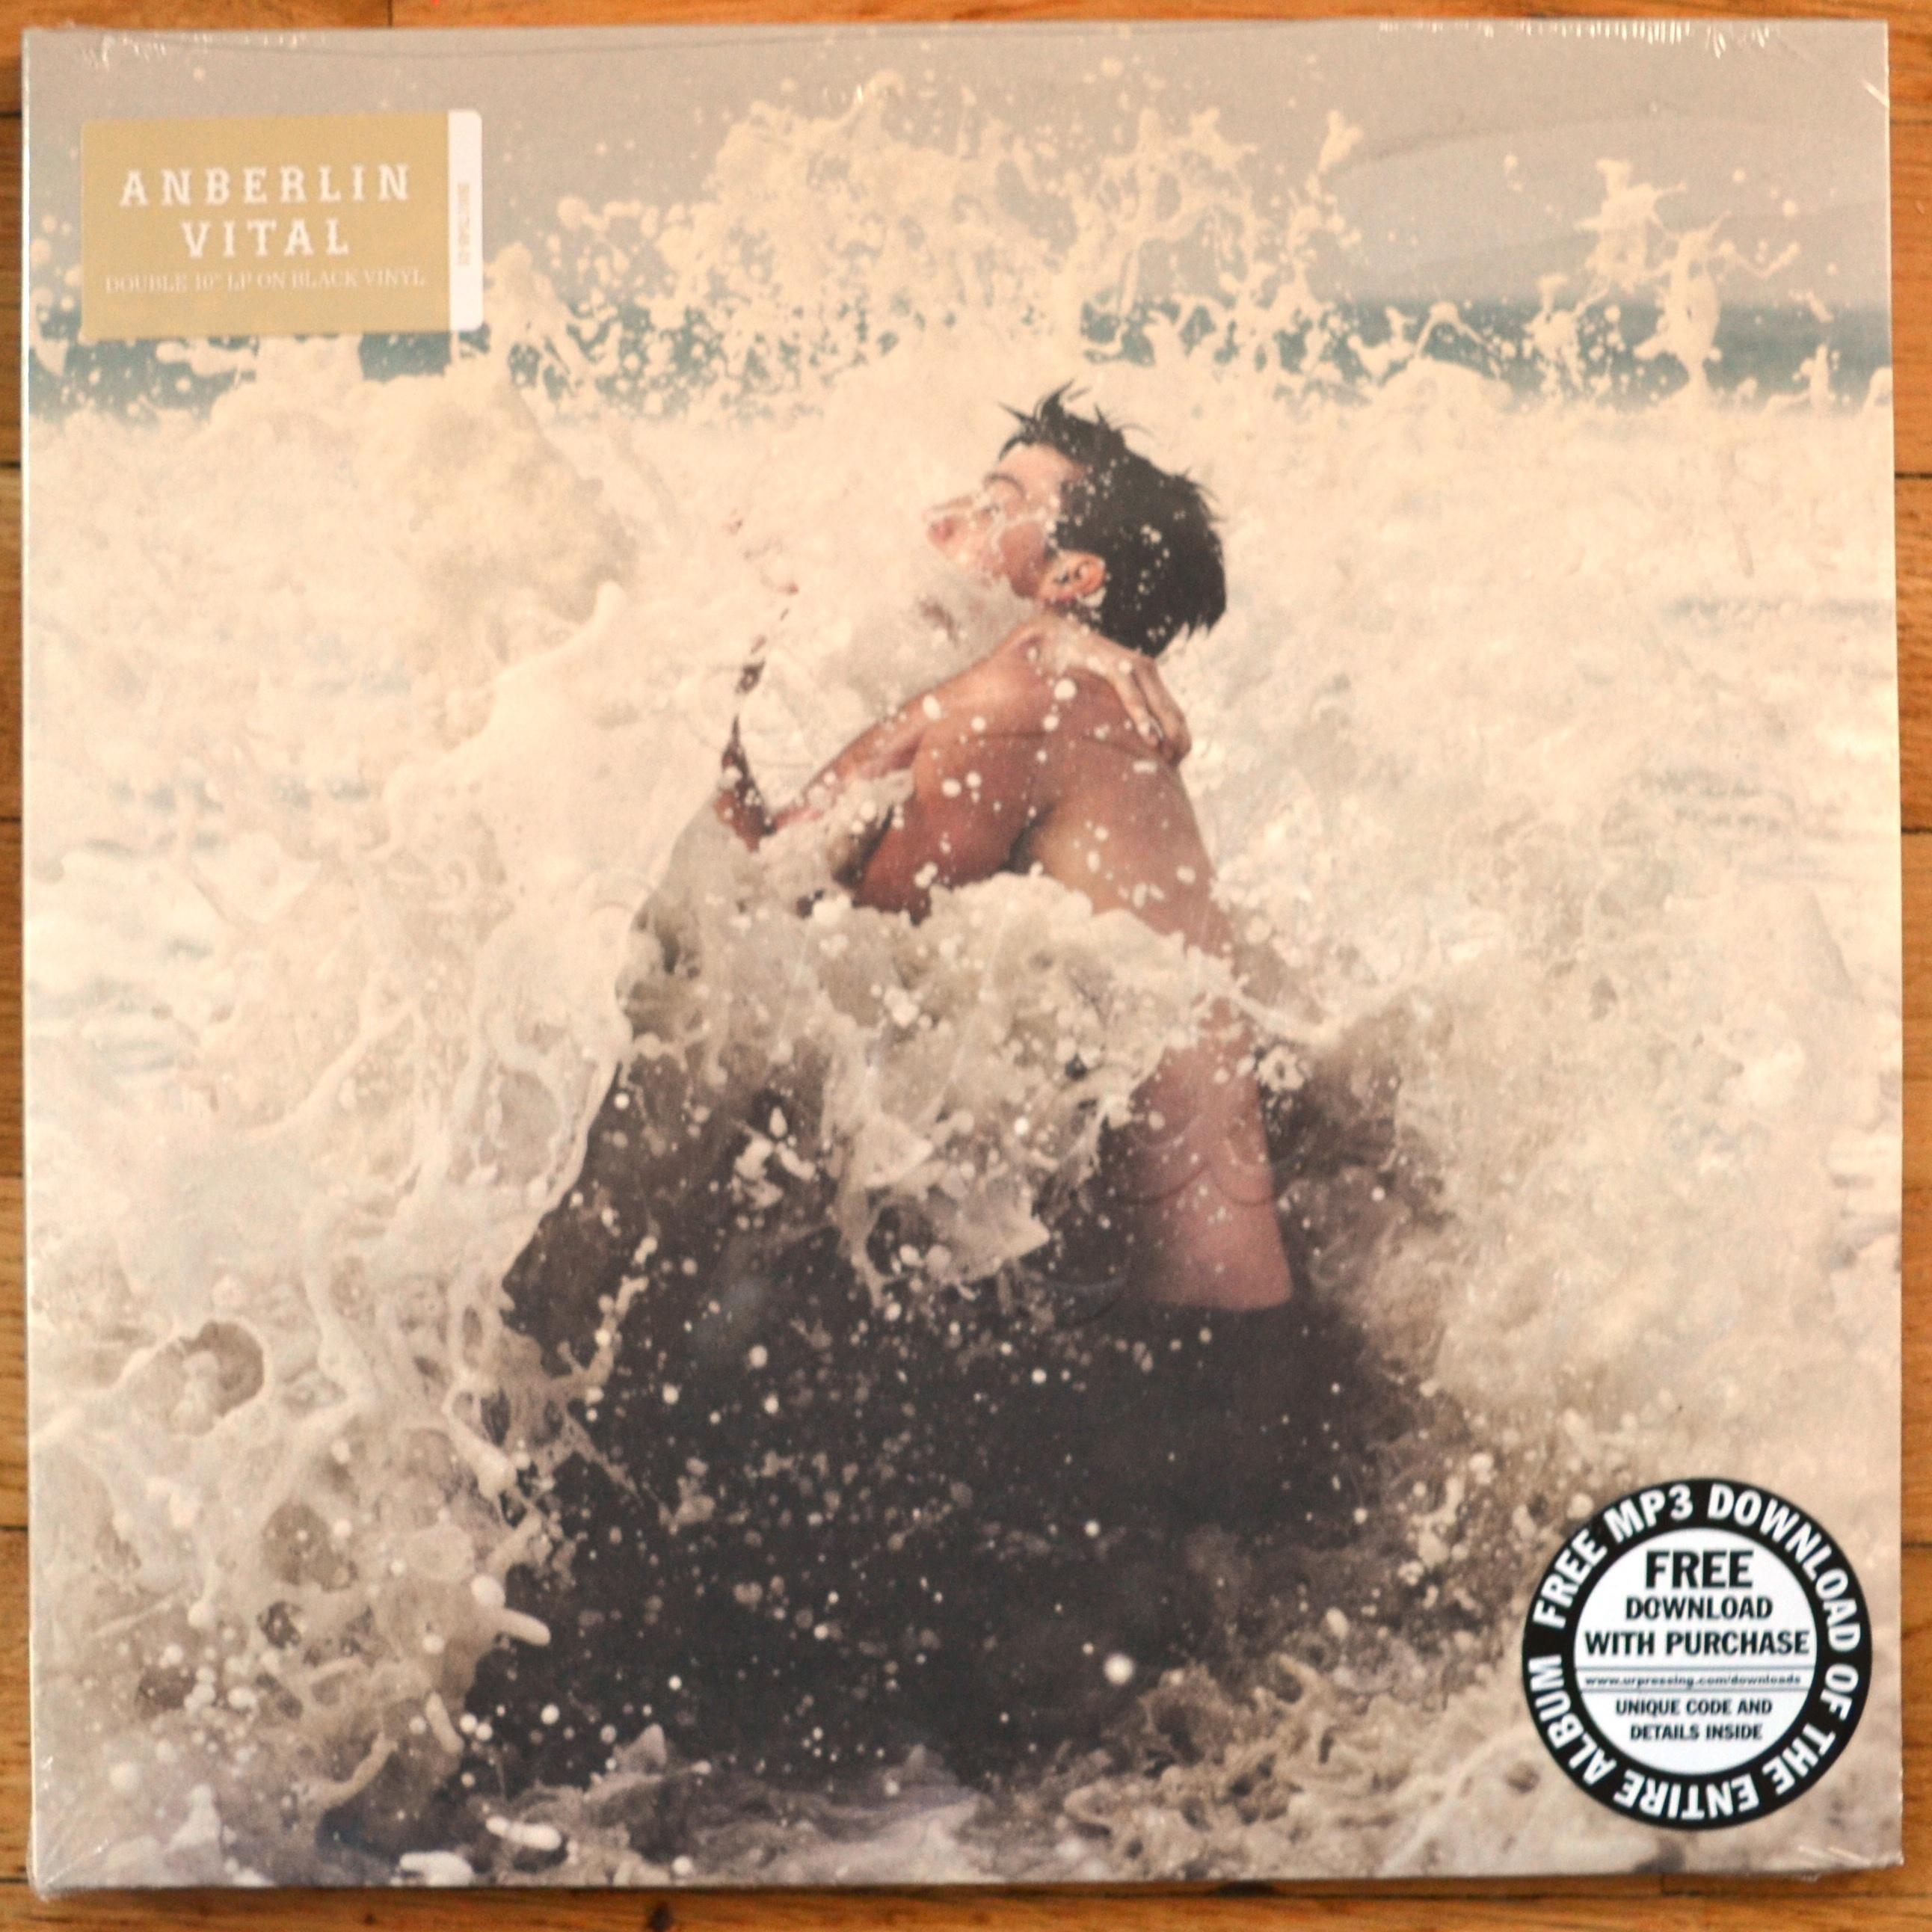 "Anberlin vital (10"" 2lp + download) – smlxl vinyl shop."